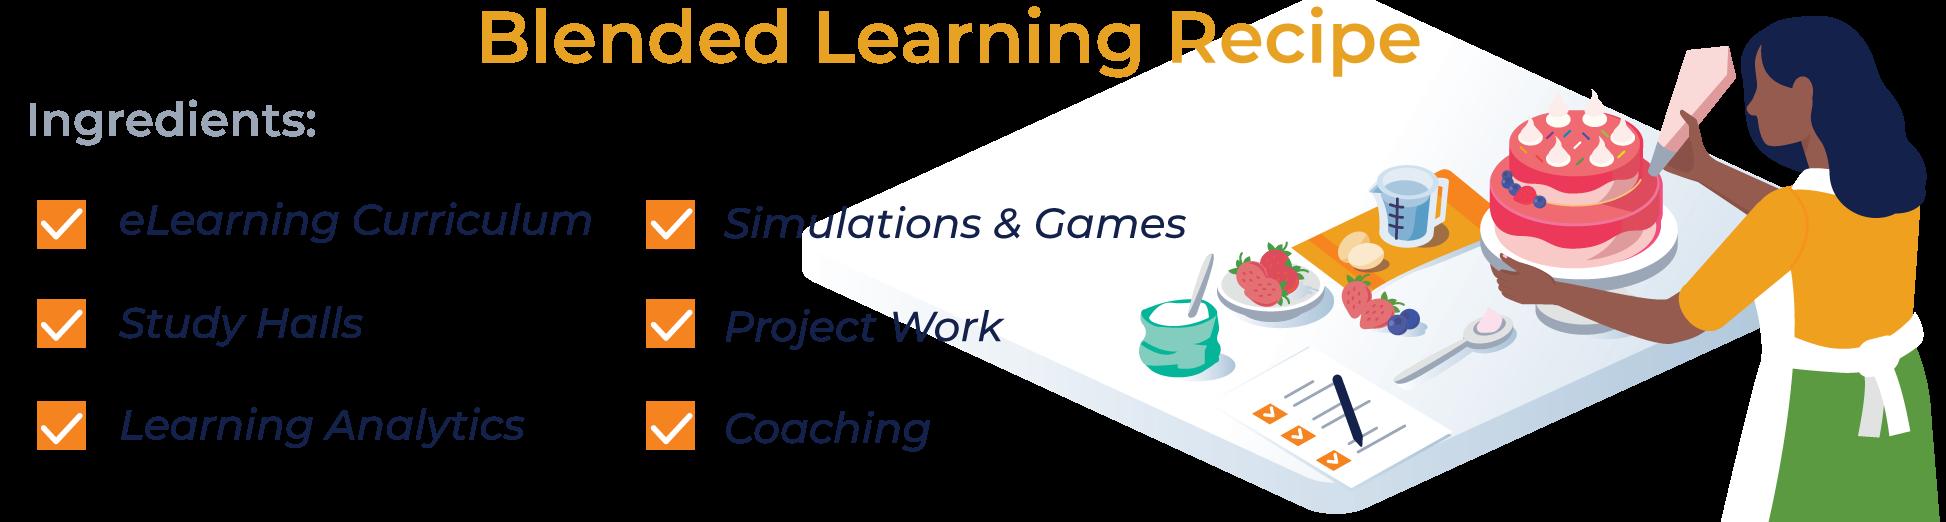 Blended Learning Recipe